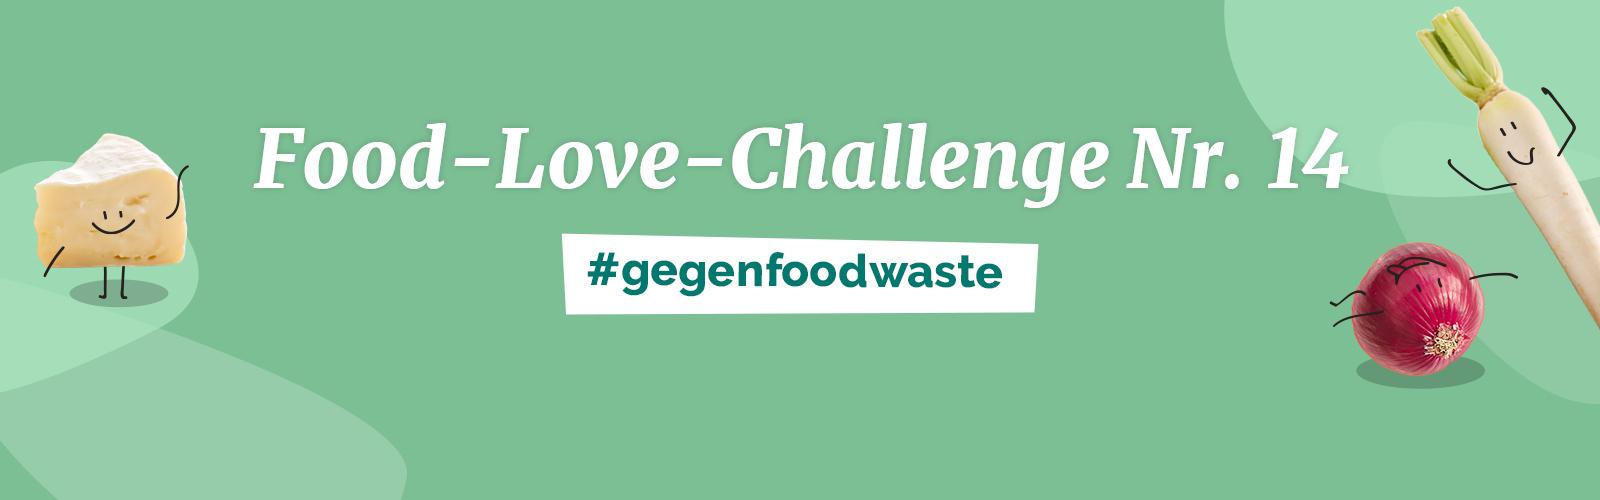 Food Love Challenge Nr. 14